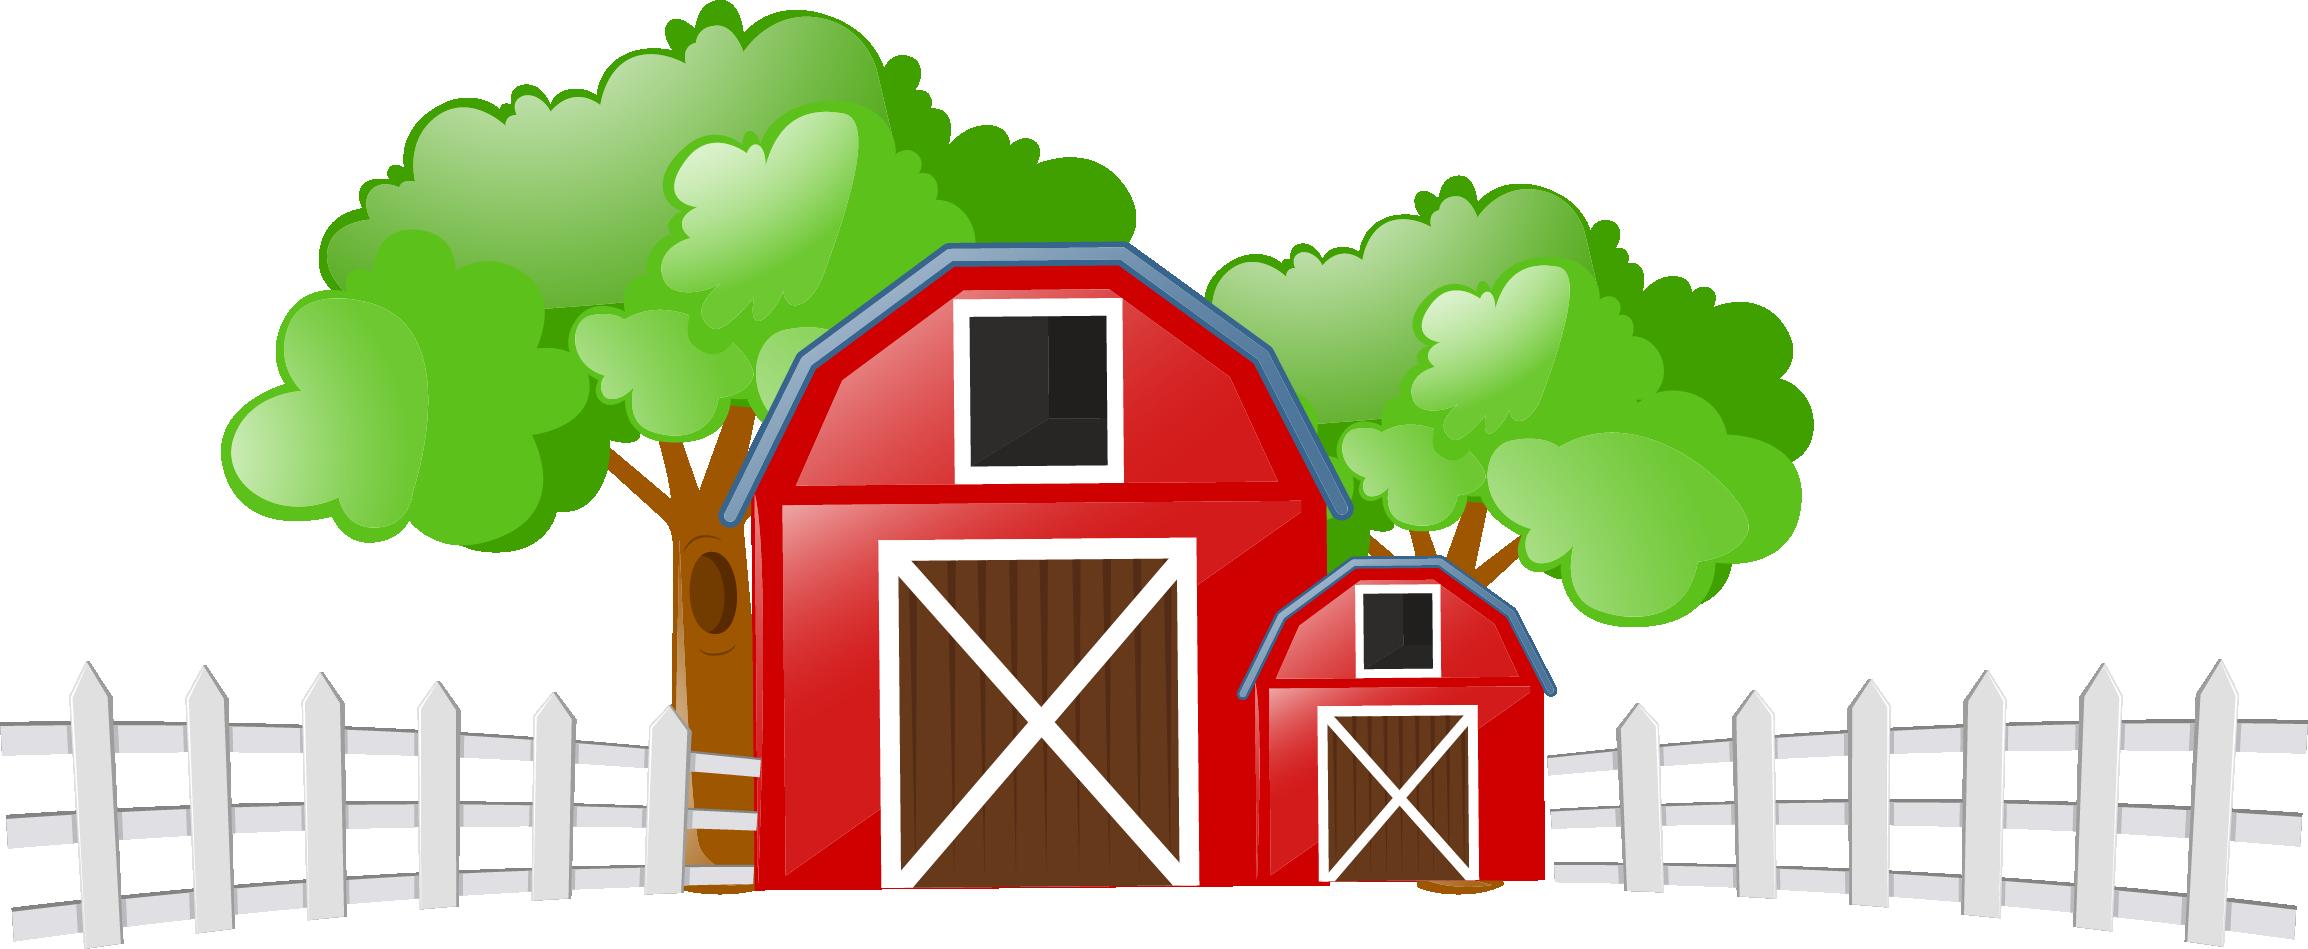 Cattle Farm Livestock Field Clip art.